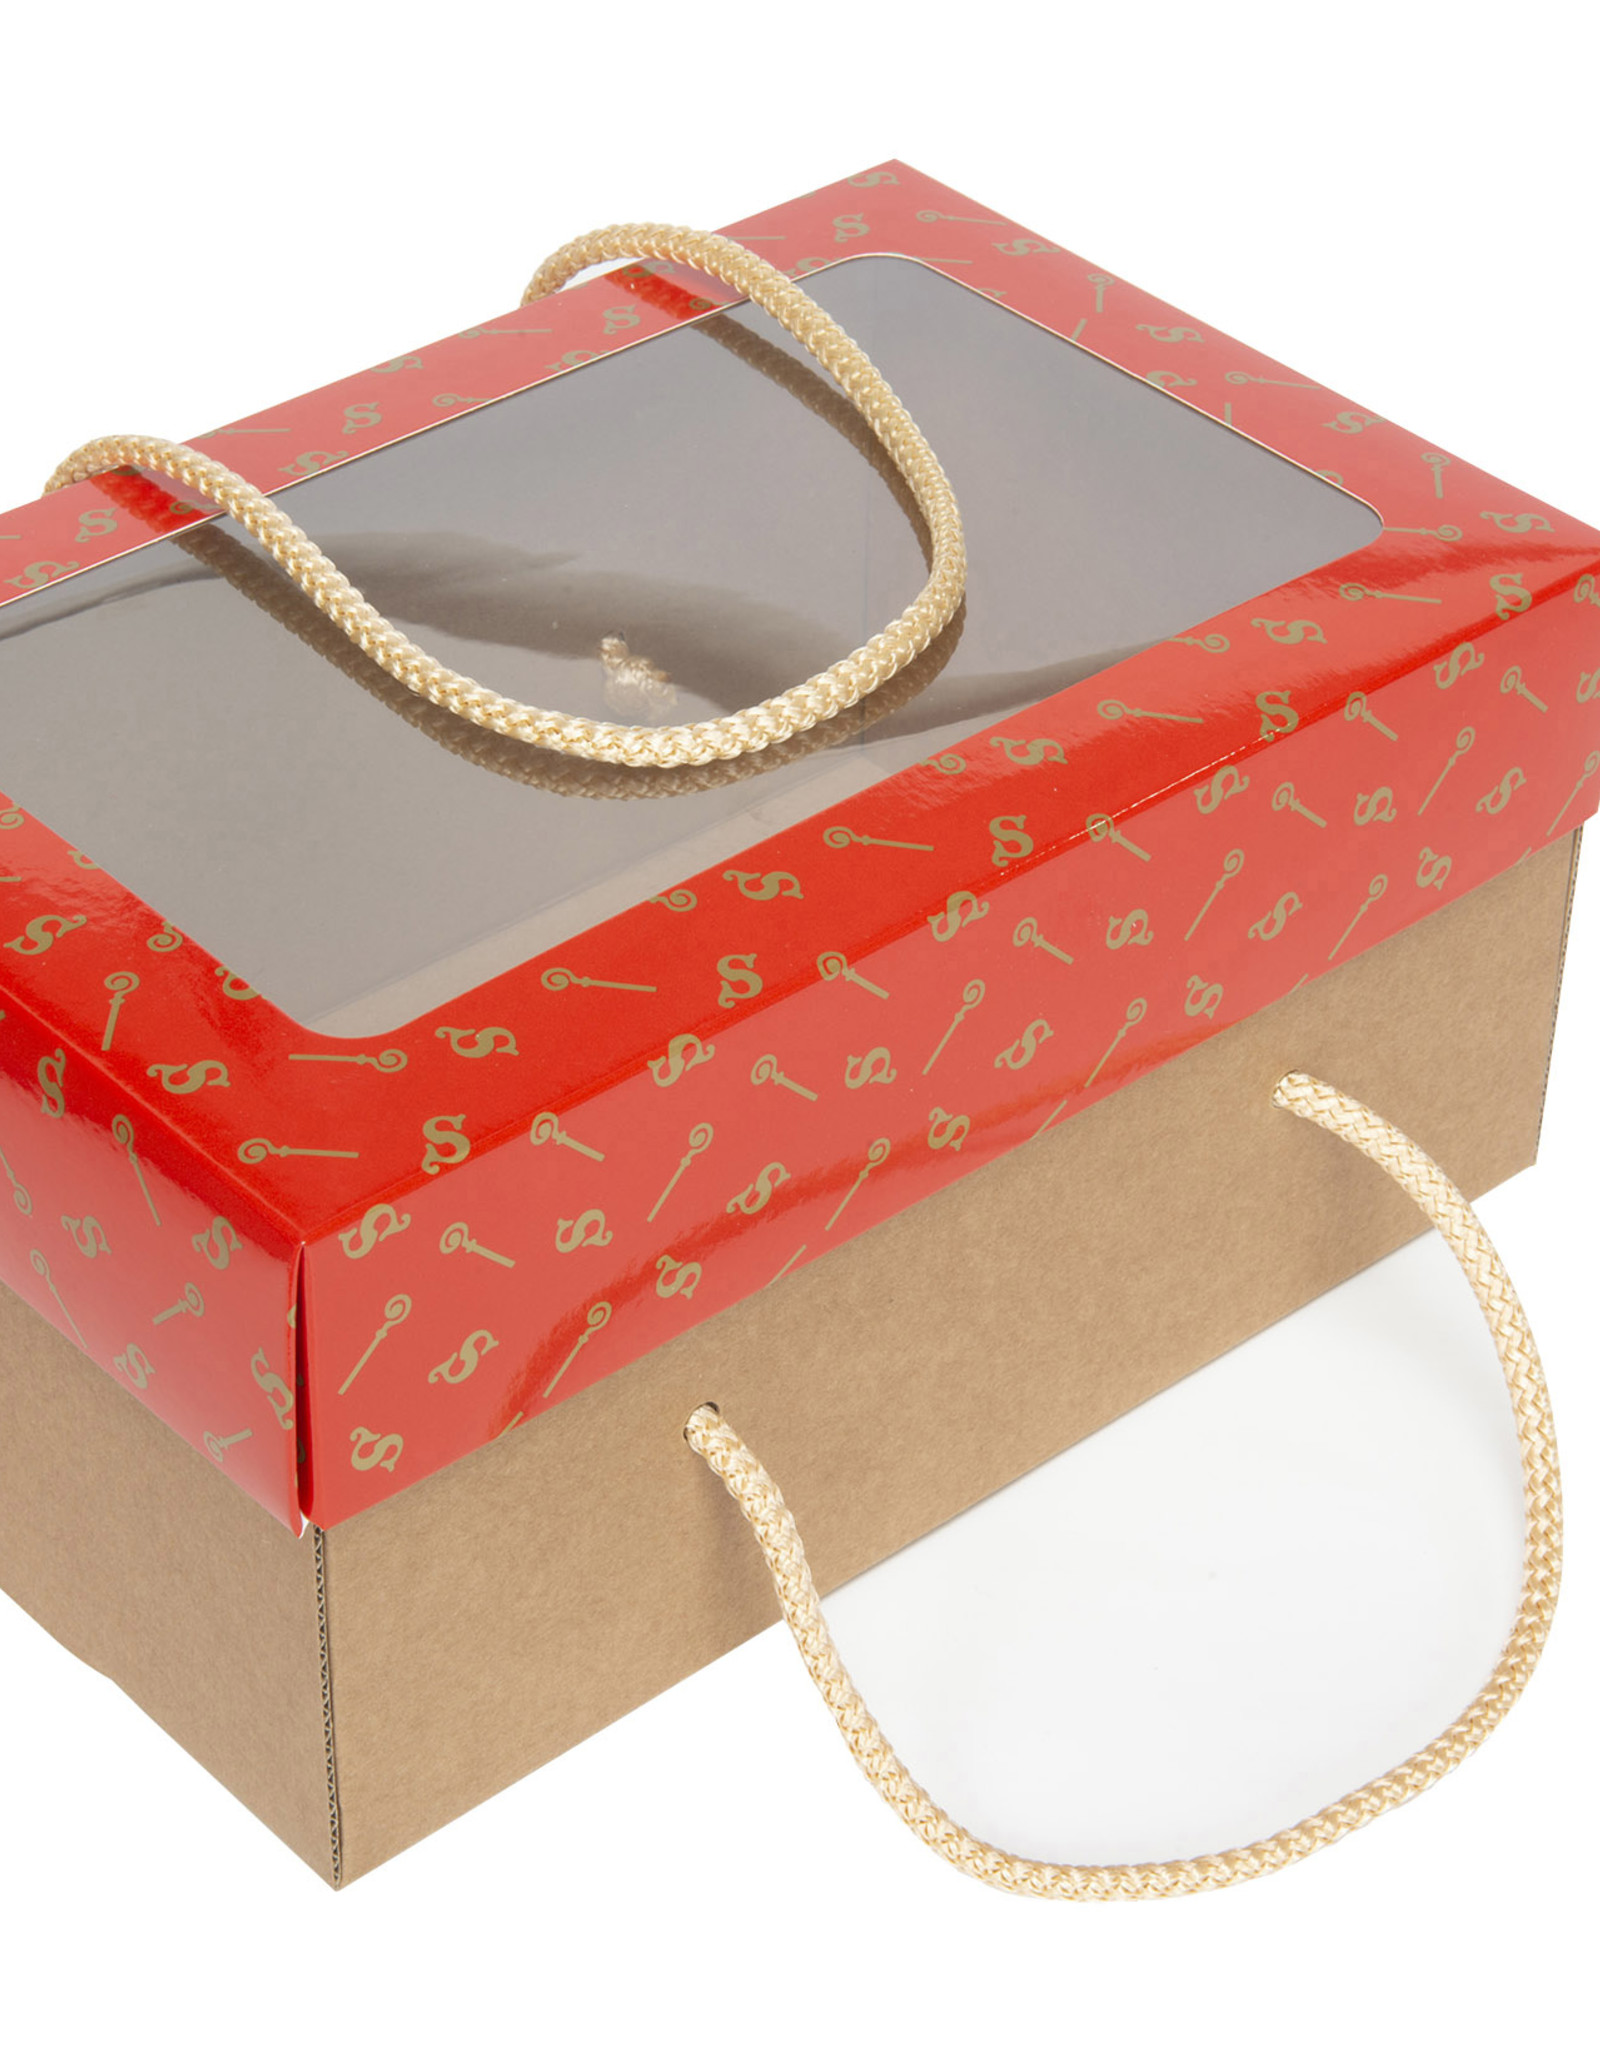 Gift box - St. Nicolas